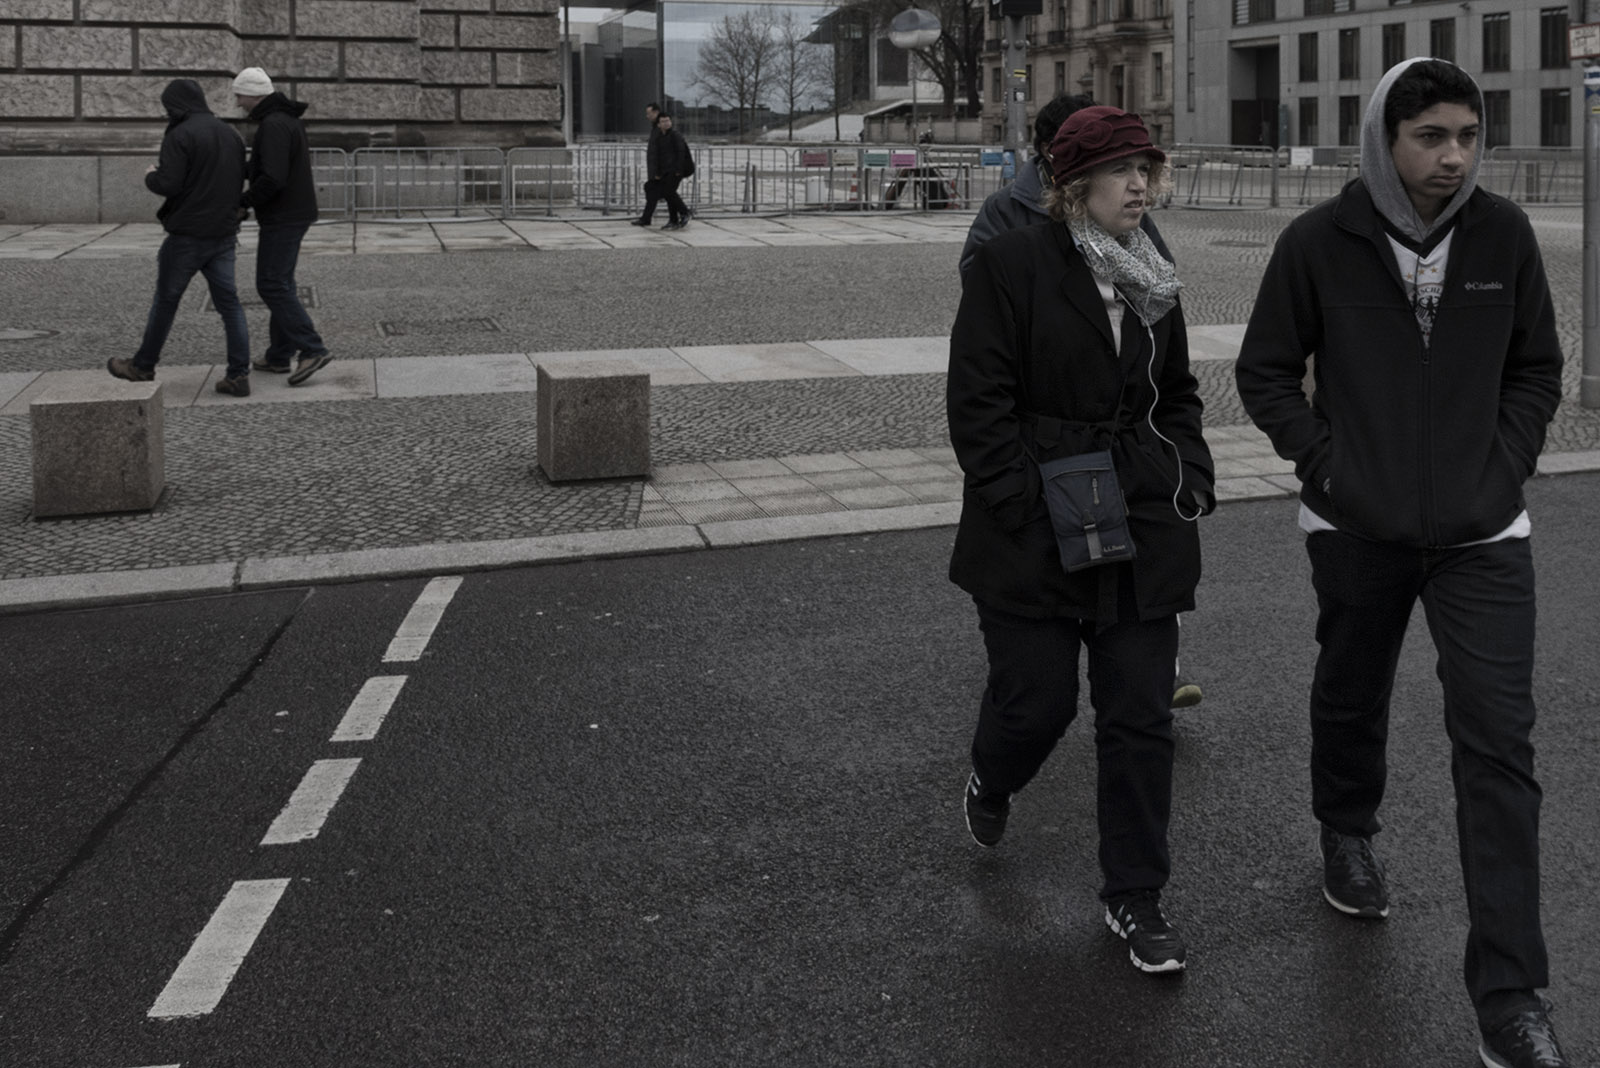 berlino_street_009.jpg